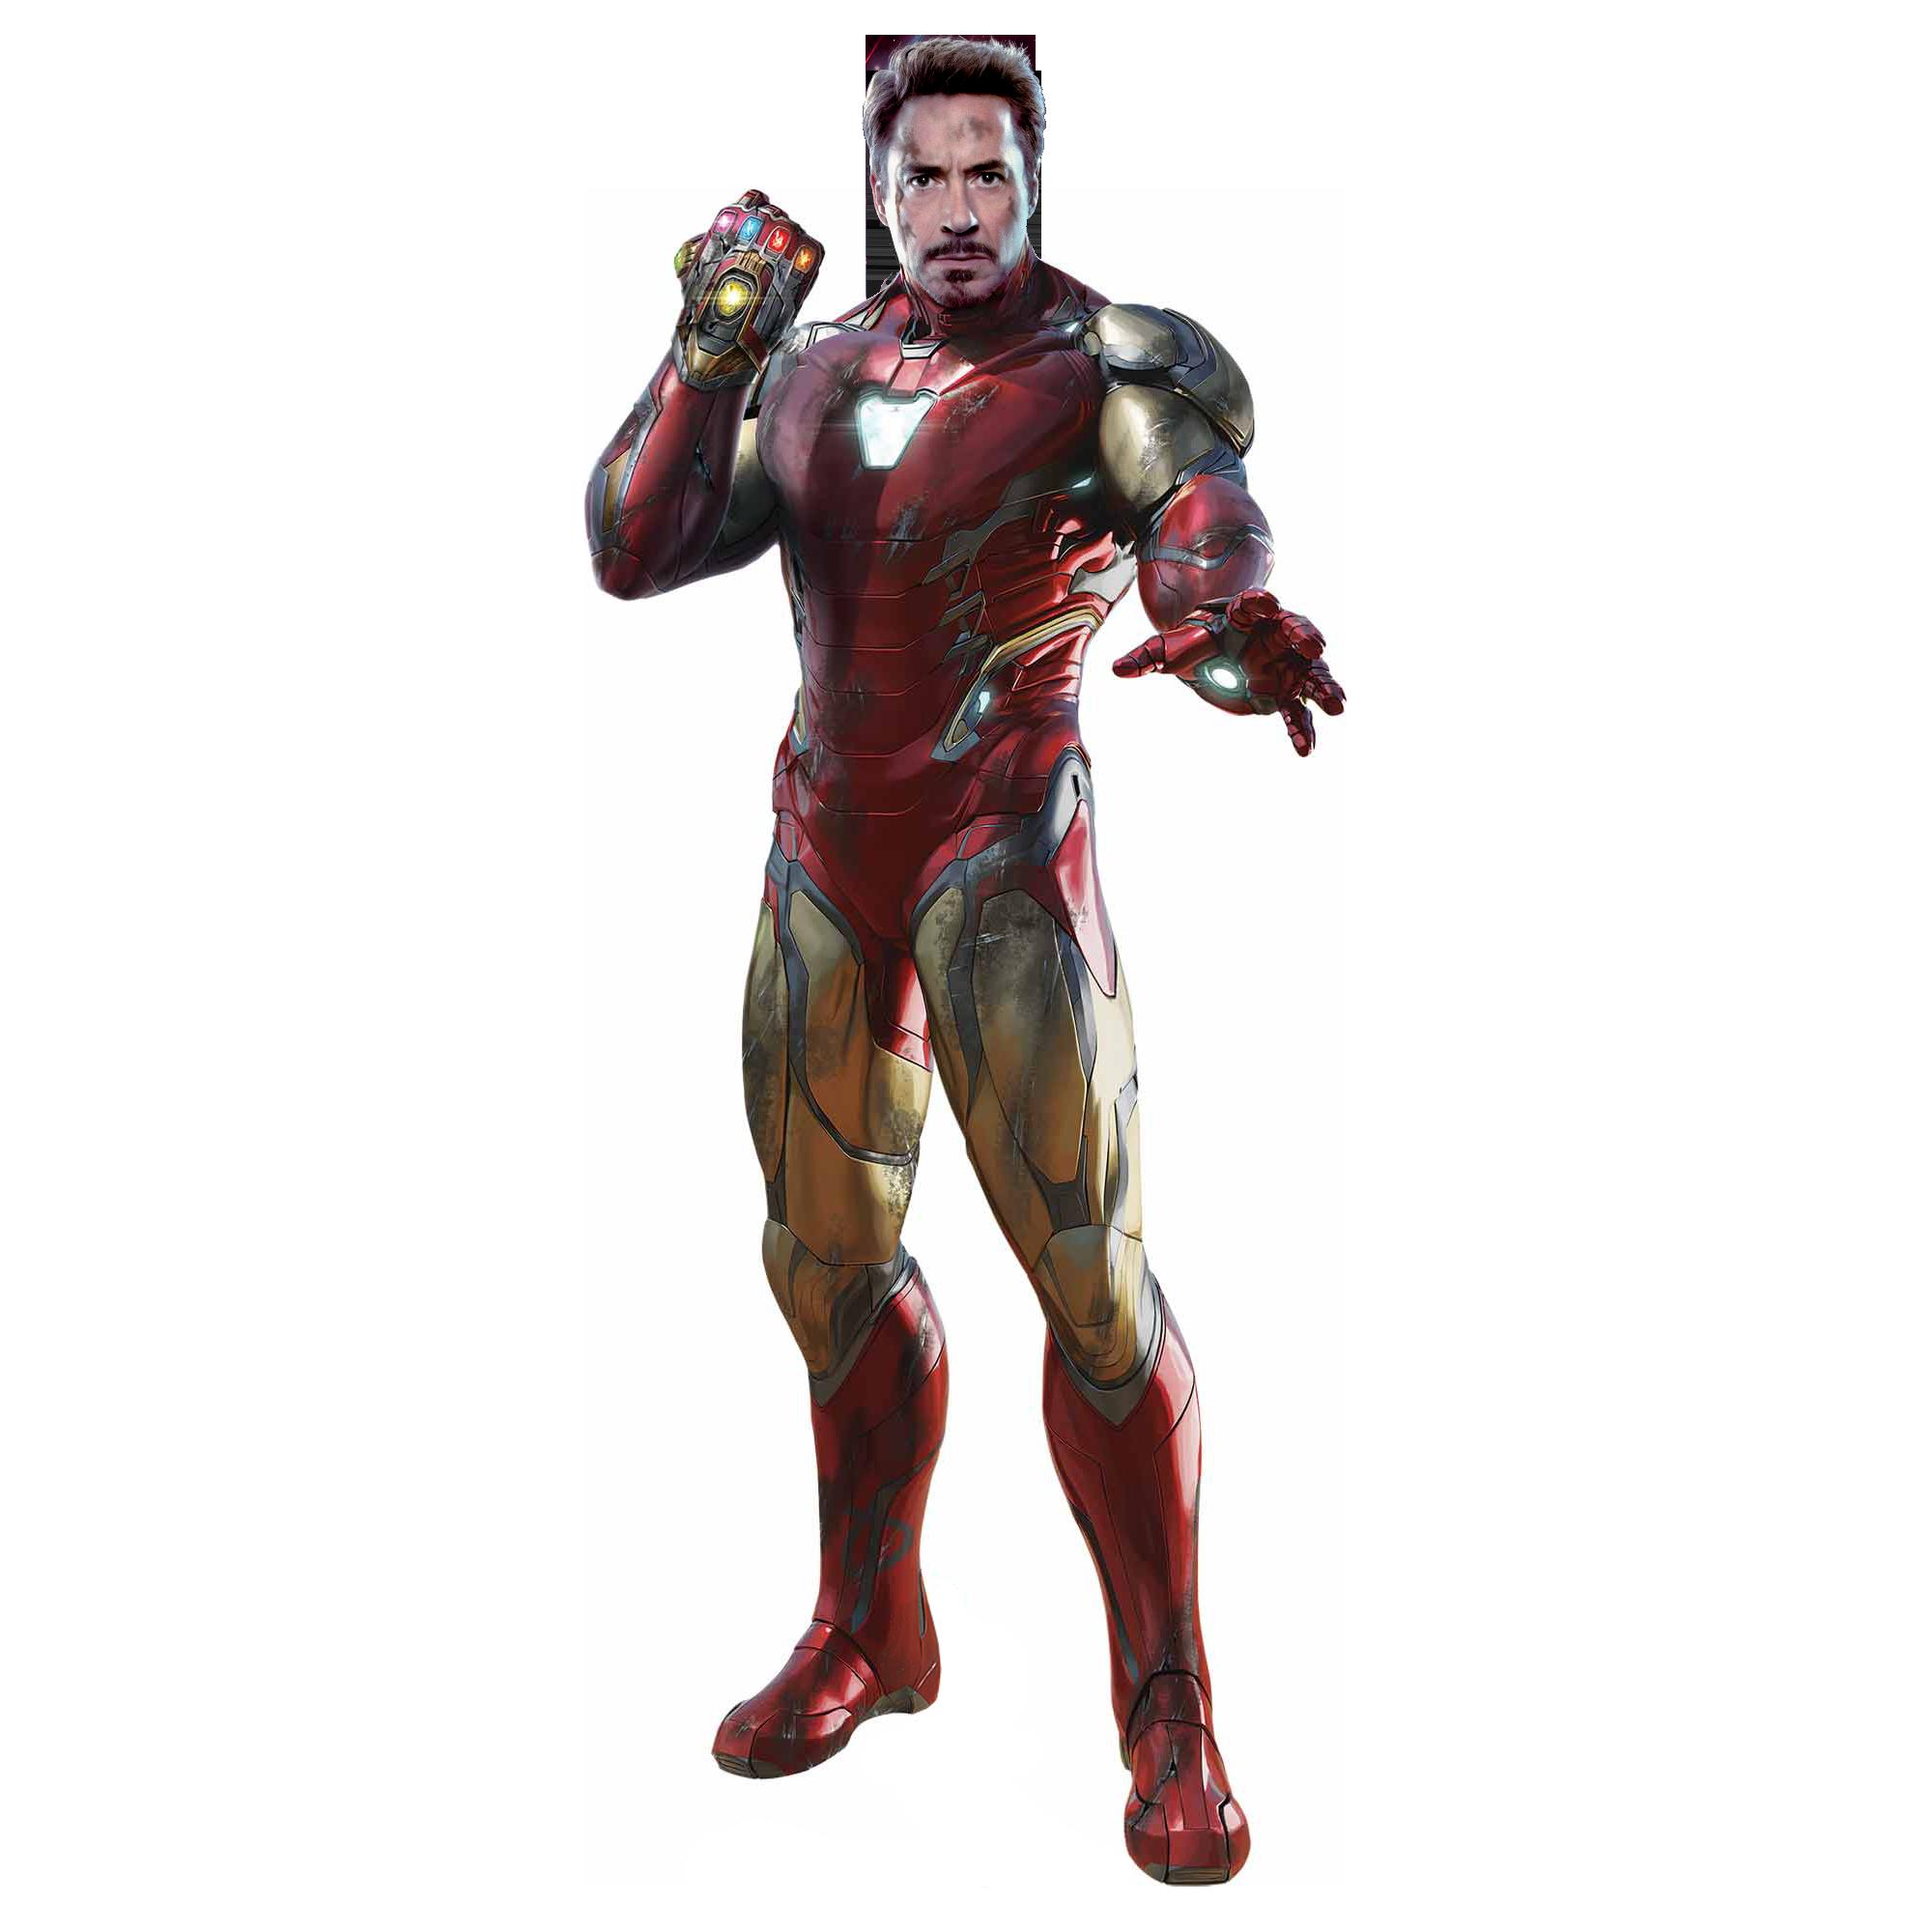 Top 10 Avengers Infinity War Party Games And Ideas Marvel Infinity Stones Superhero Birthday Party Games Marvel Birthday Party